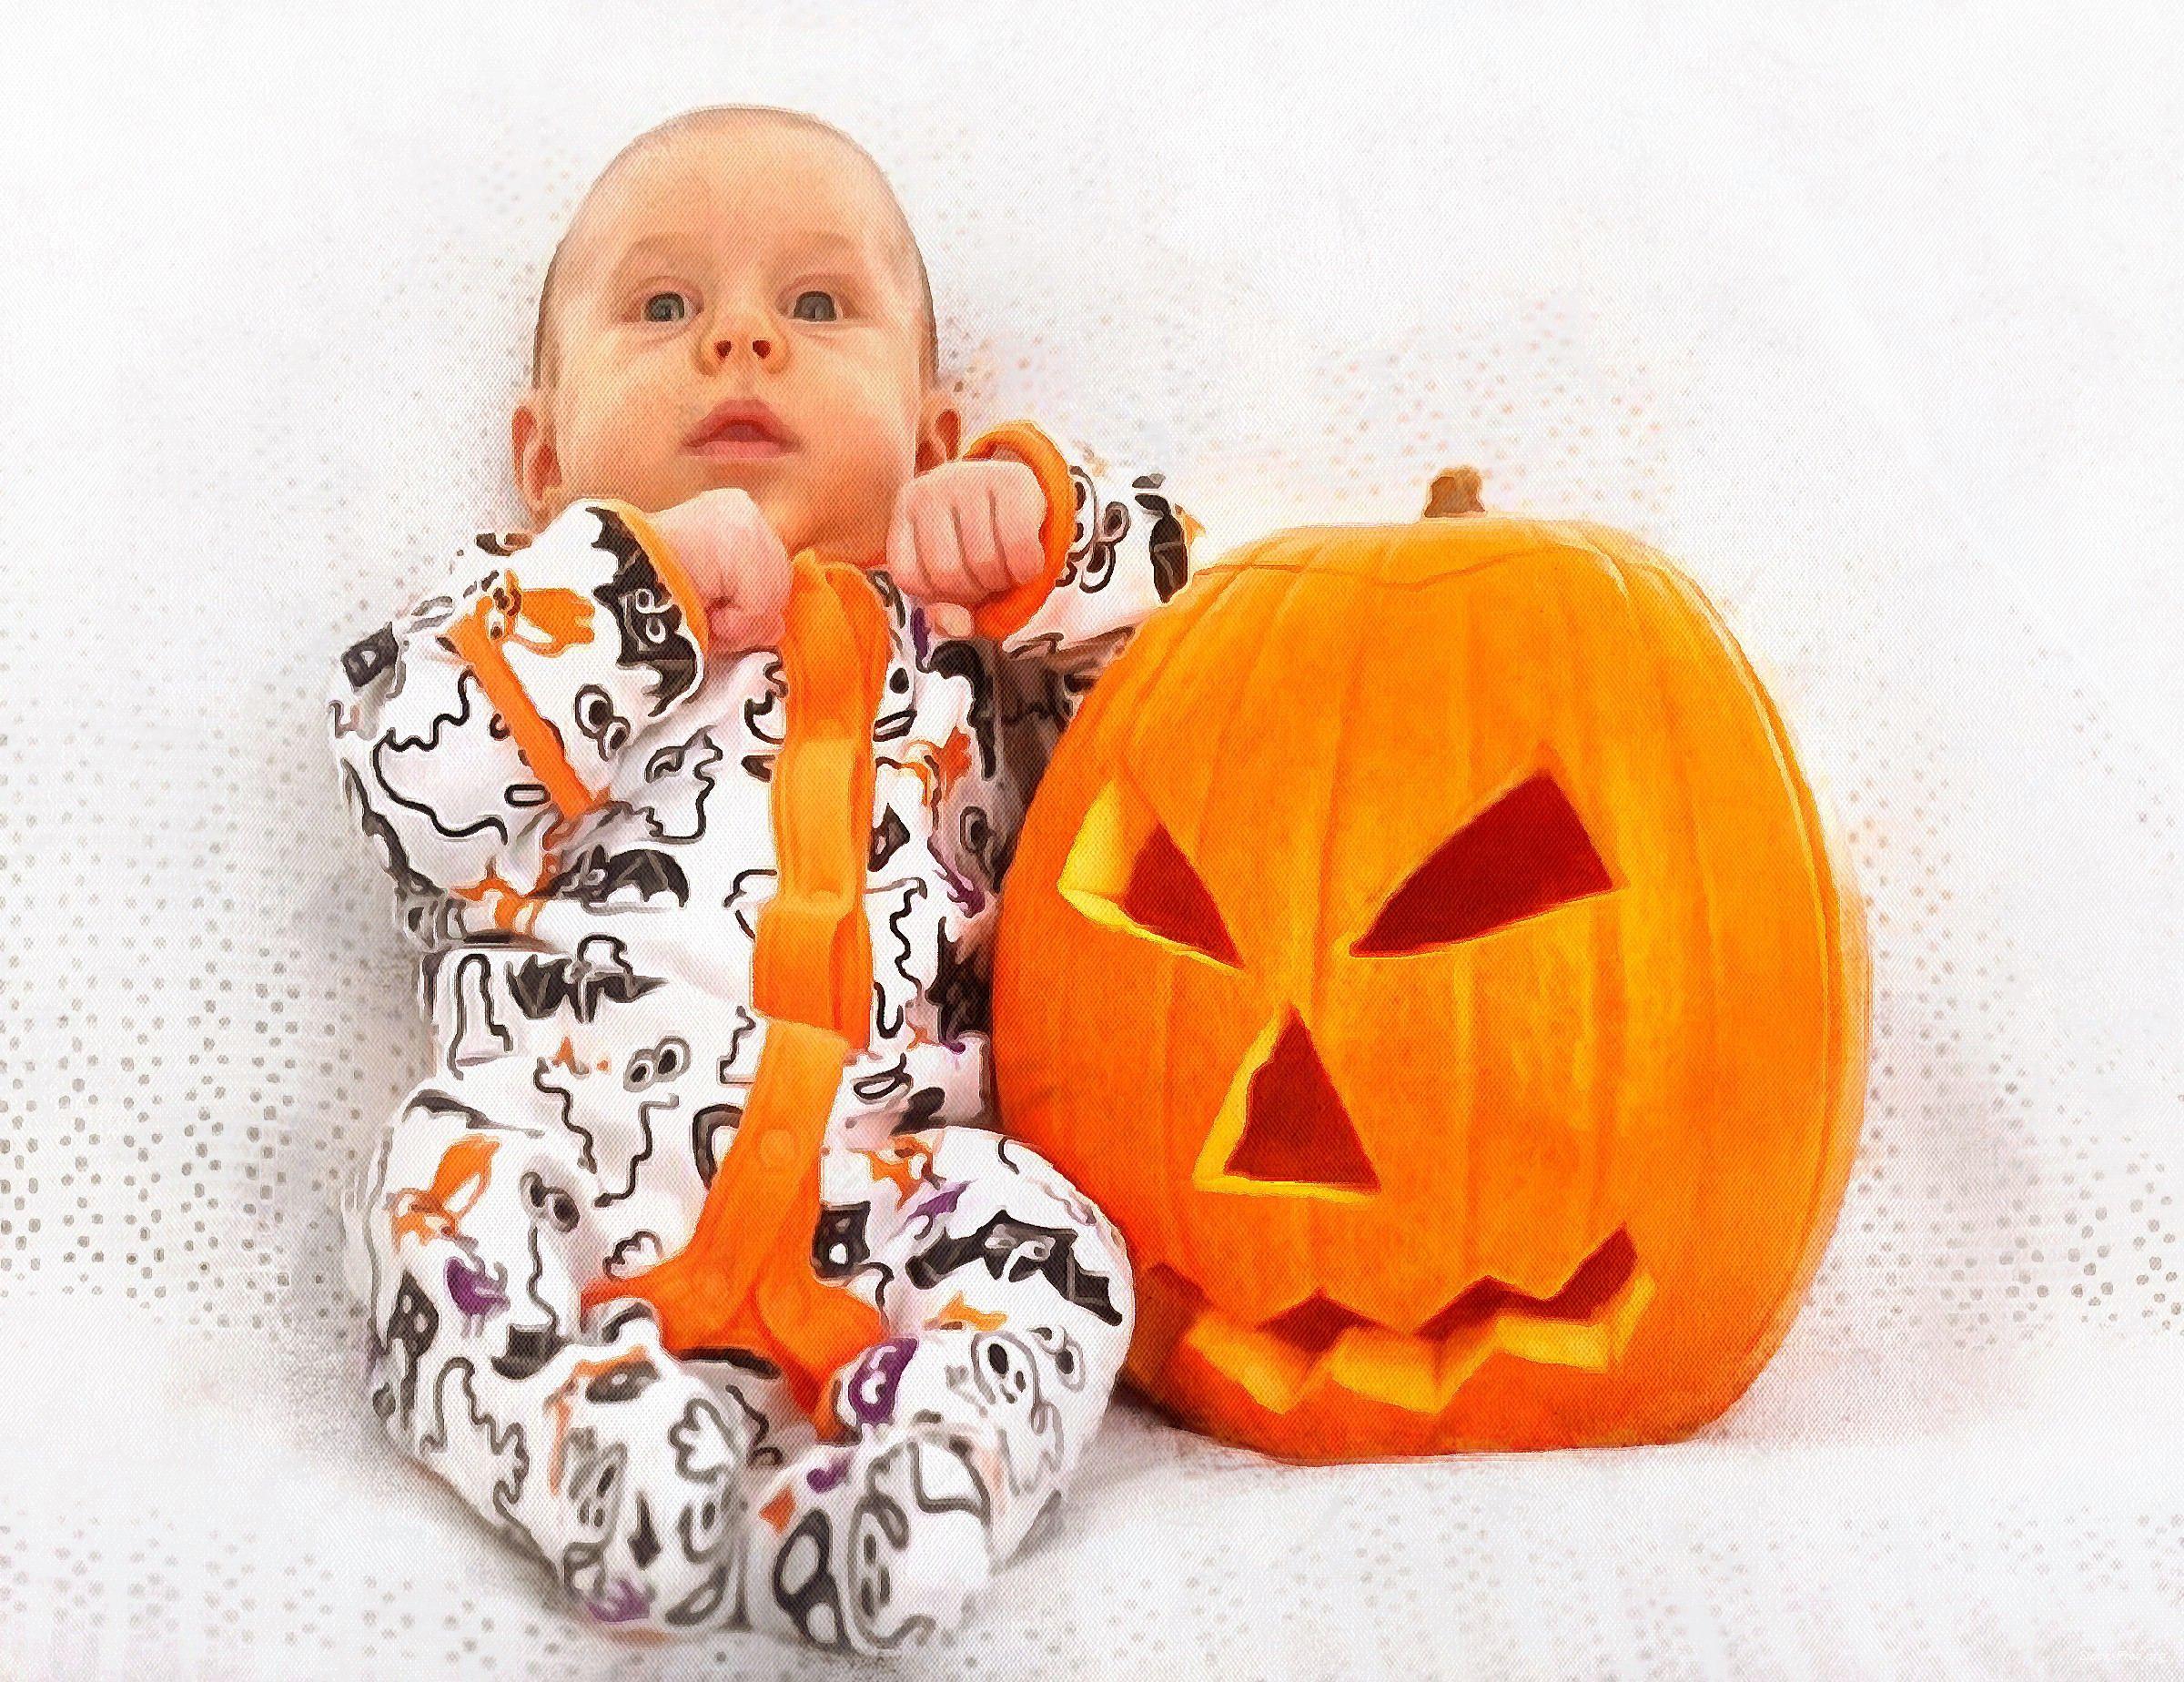 child, holiday, pumpkin, - Halloween Free Image, Free Images, Public Domain images, Stock Free Images, Download Image for Free, Halloween Stock Free Images!